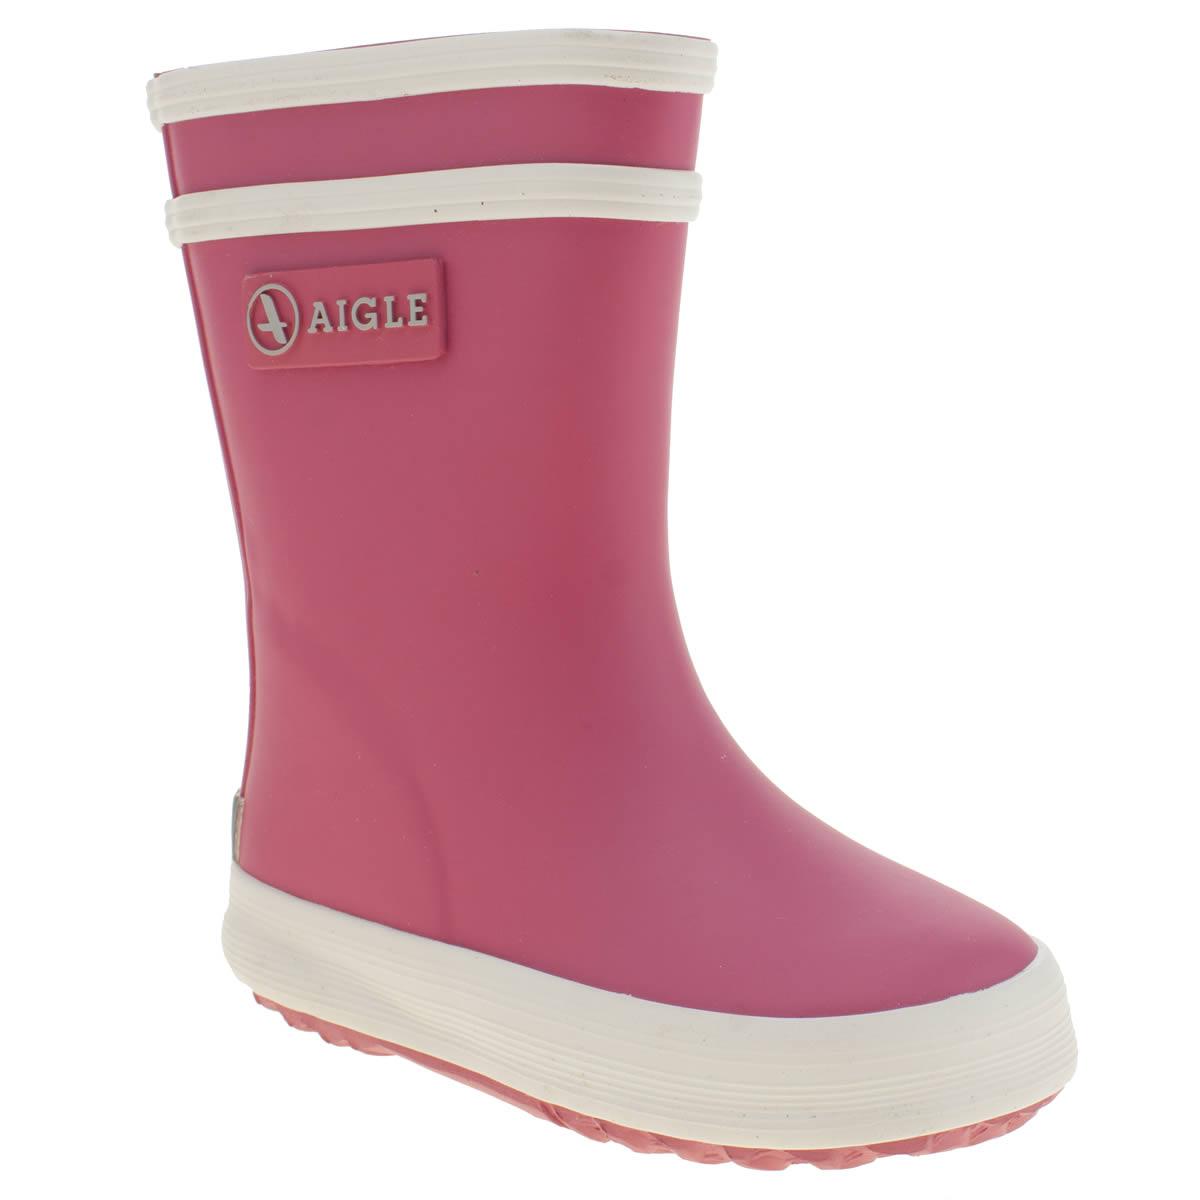 Aigle Aigle Pink Baby Flac Girls Toddler